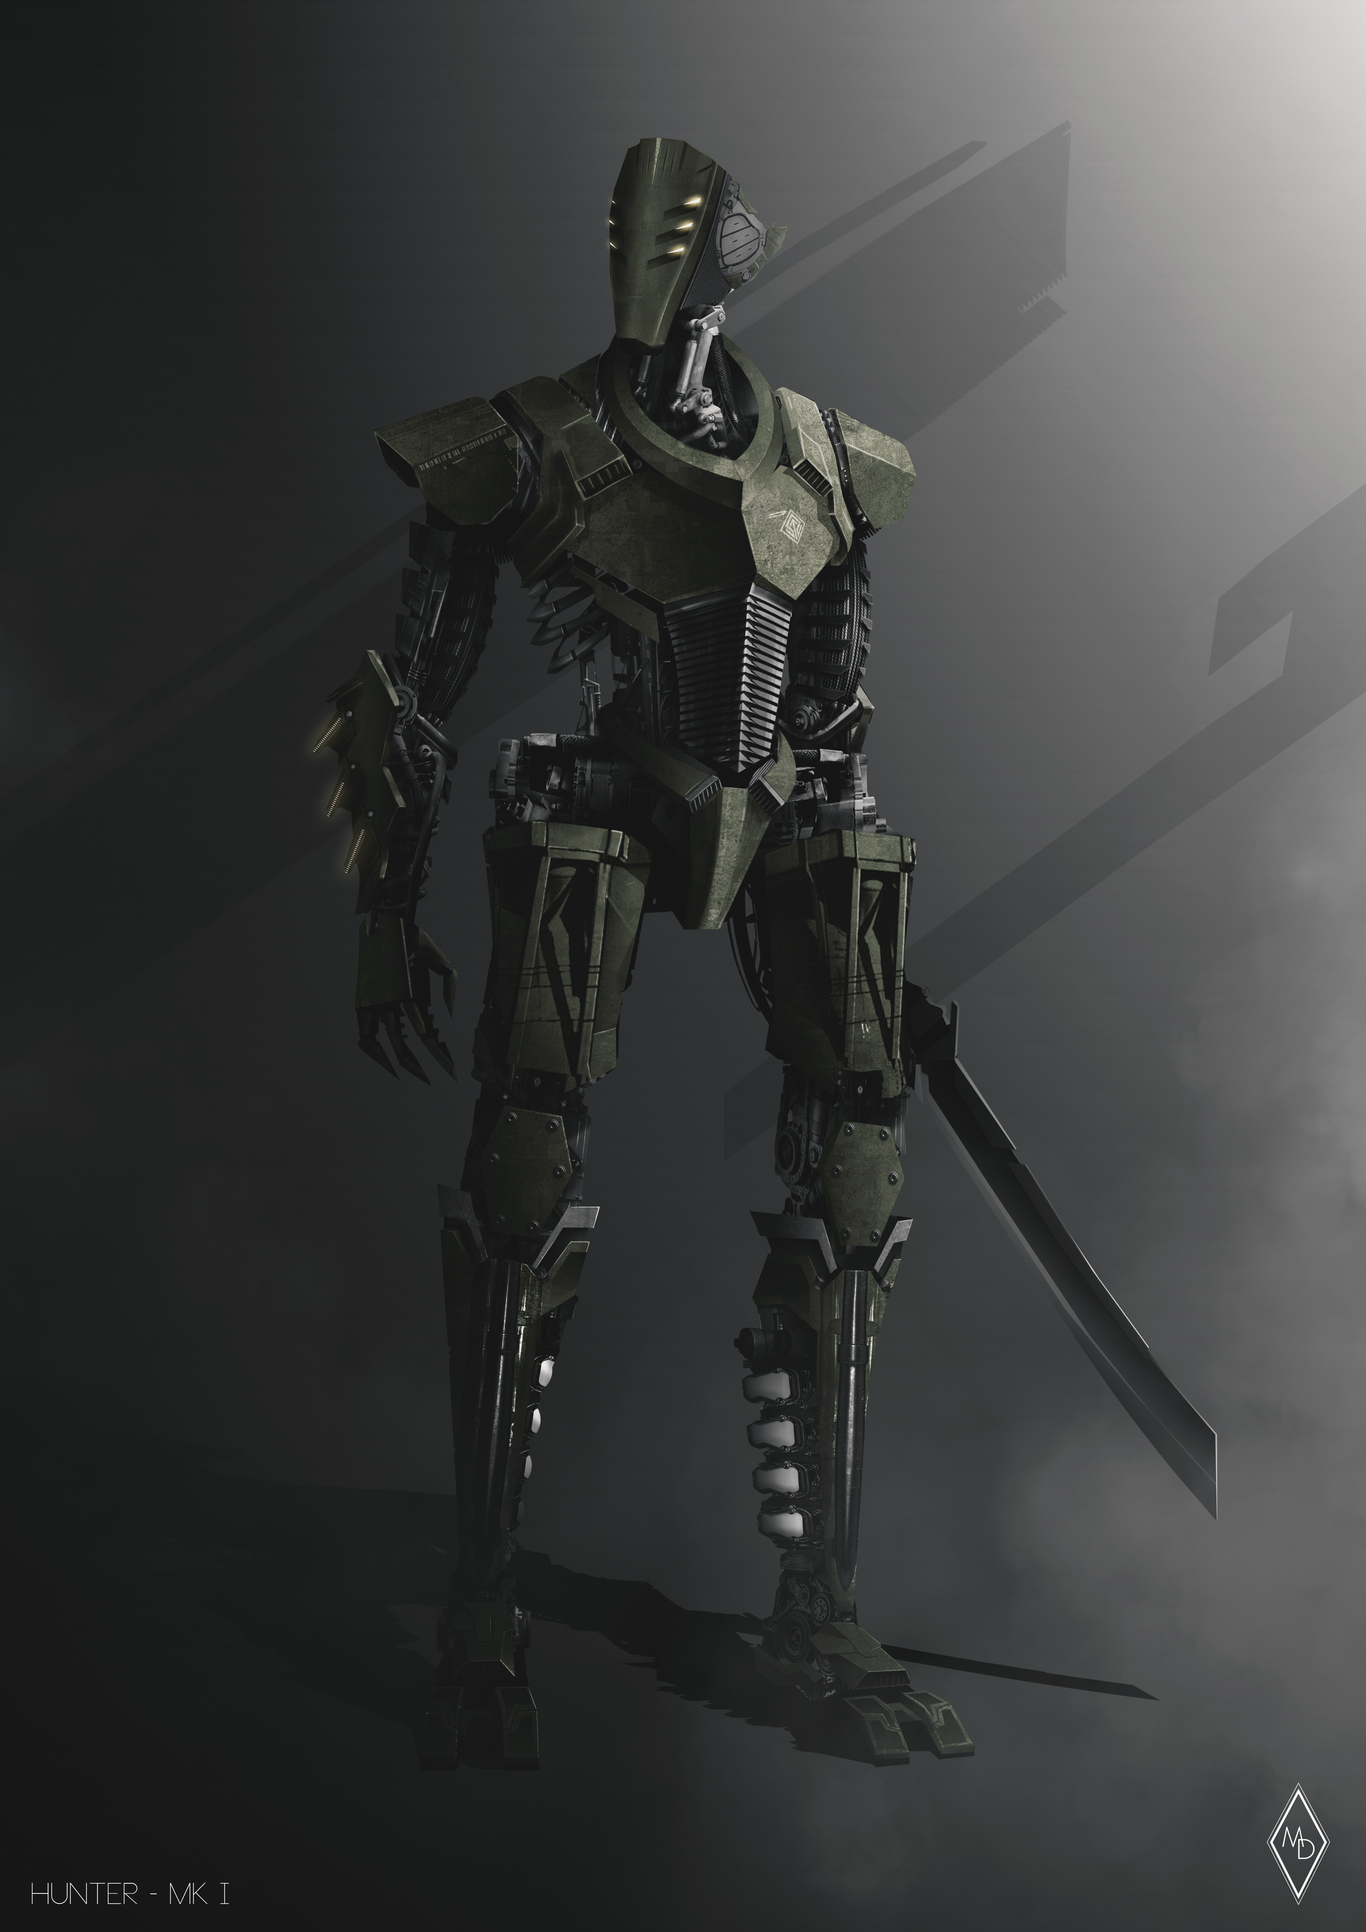 Max alphageddon hunter mk1 1 b44a0b53 sbpg